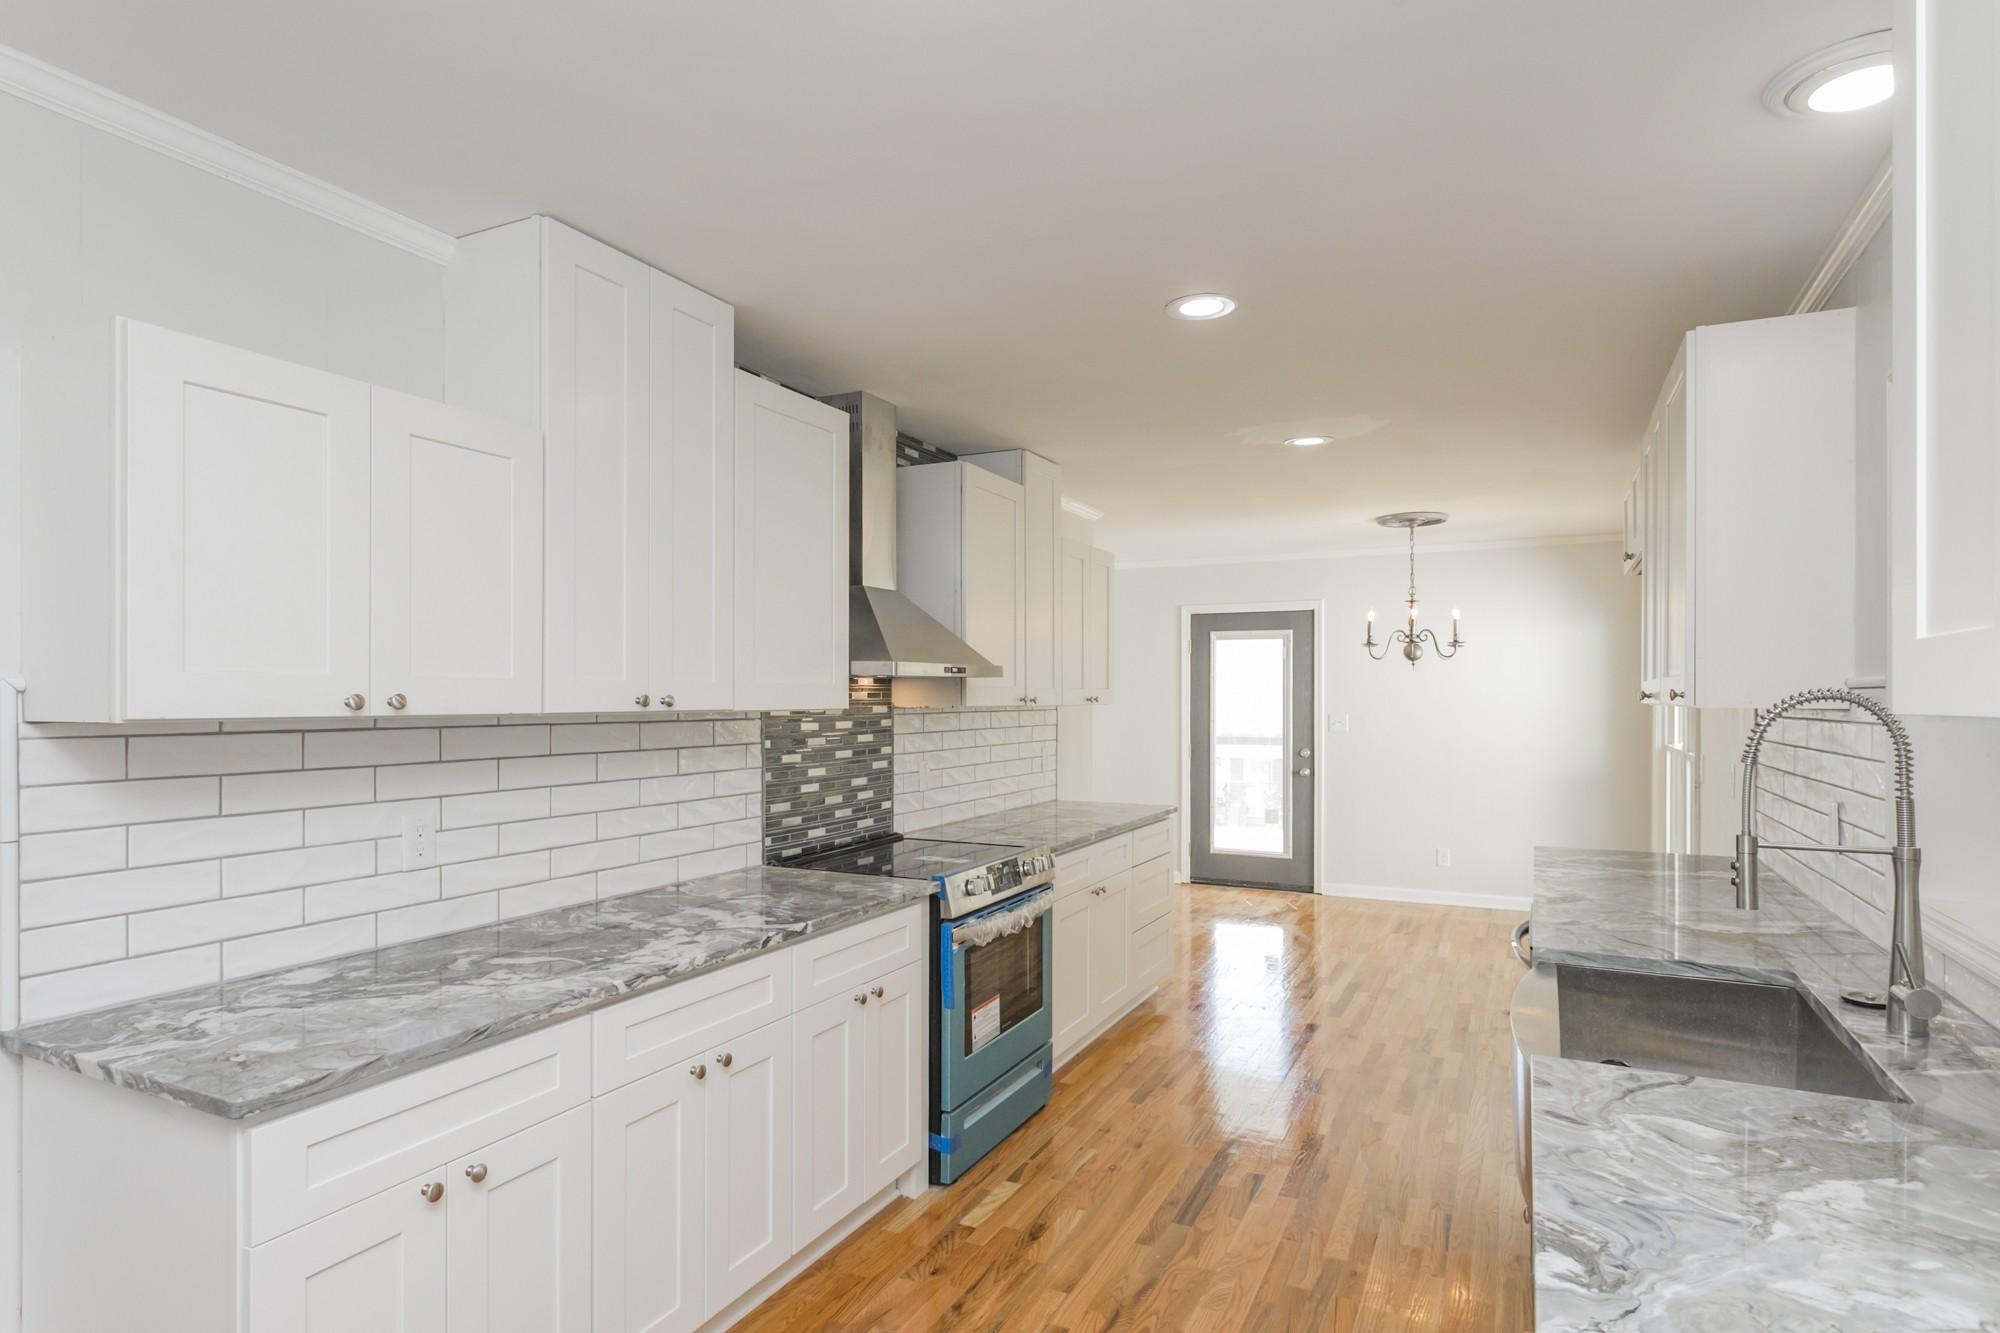 106 Fairview Dr, Mount Pleasant, TN 38474 - Mount Pleasant, TN real estate listing